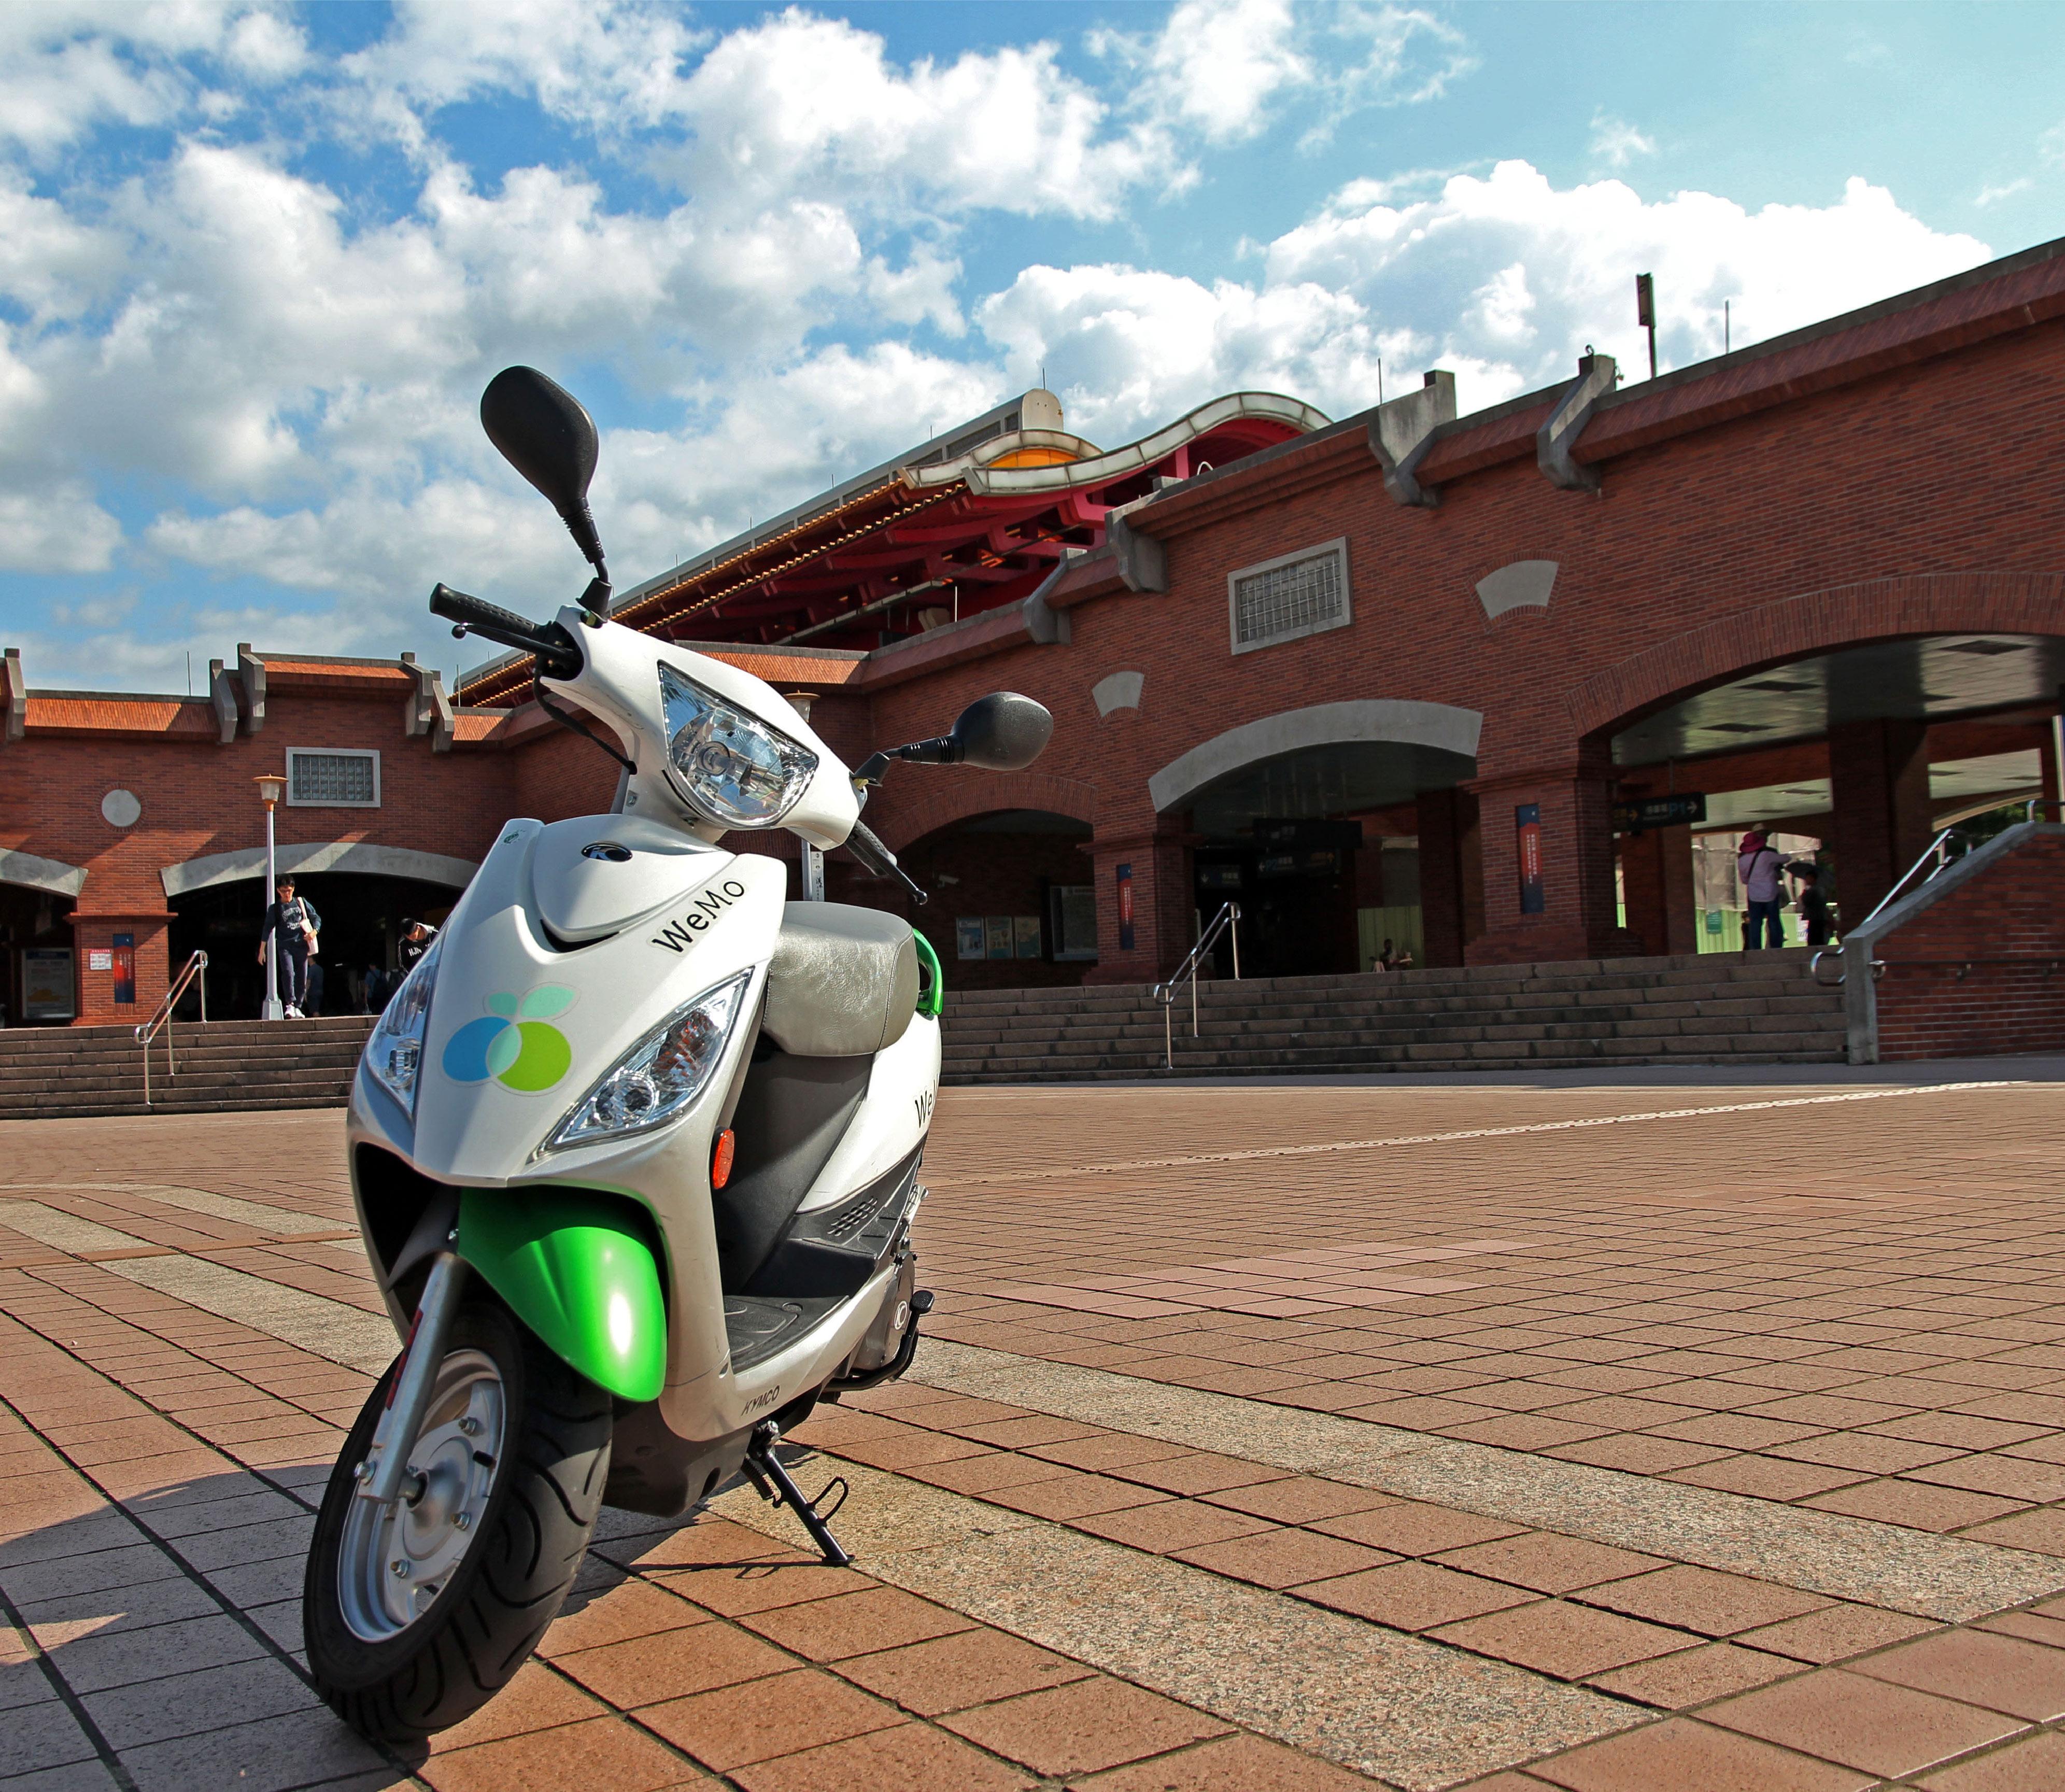 WeMo Scooter 進駐淡水觀光區,用共享電動機車深度玩紅毛城、漁人碼頭各景點